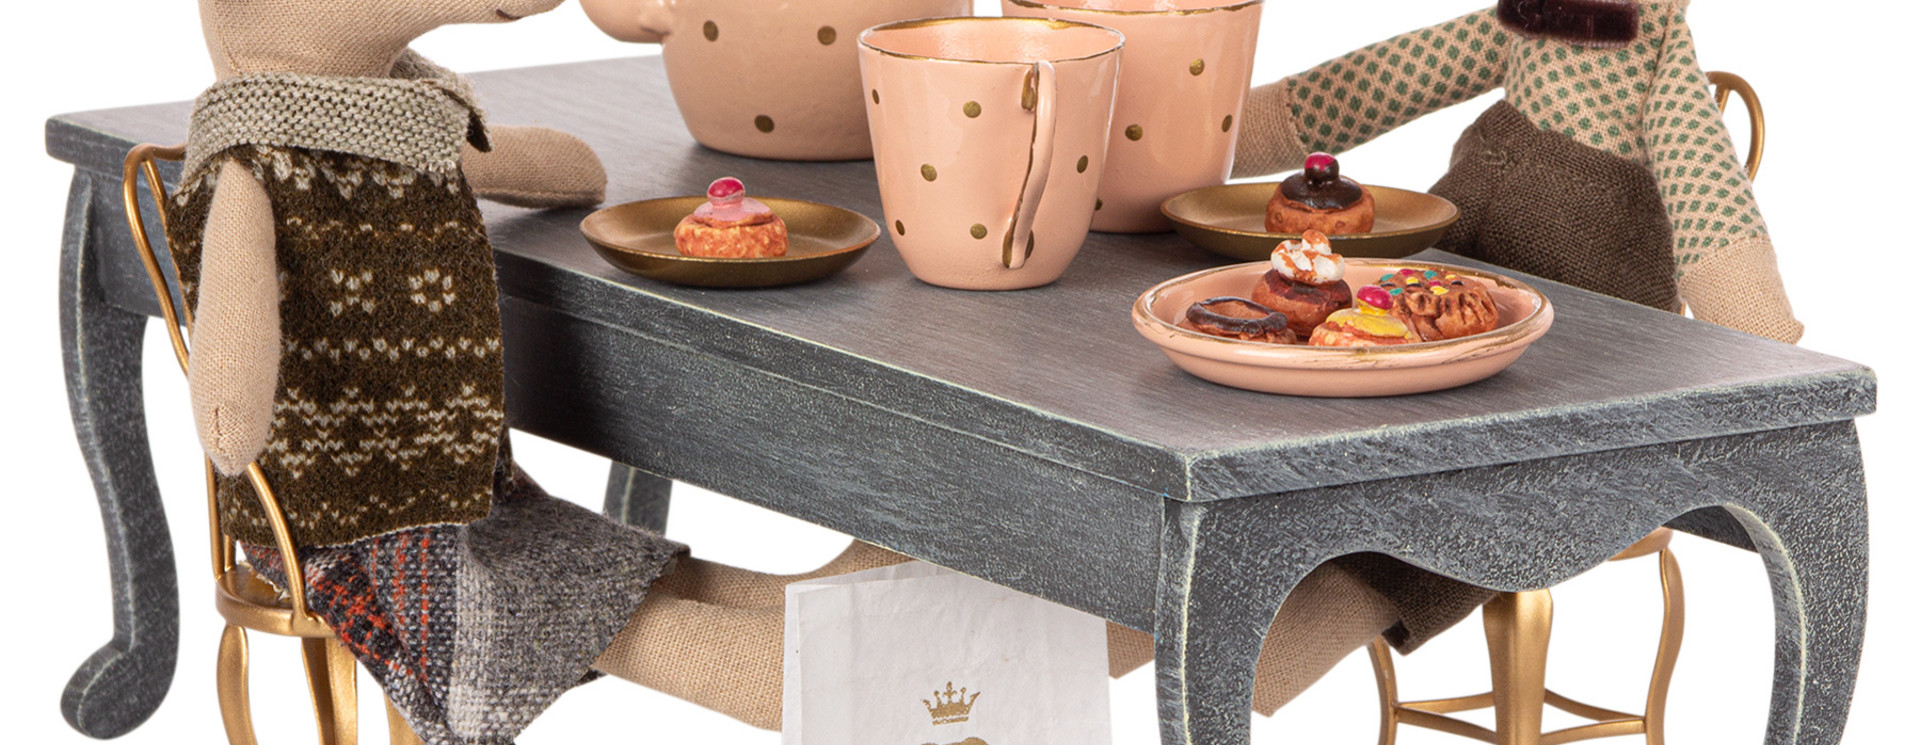 Maileg Furniture